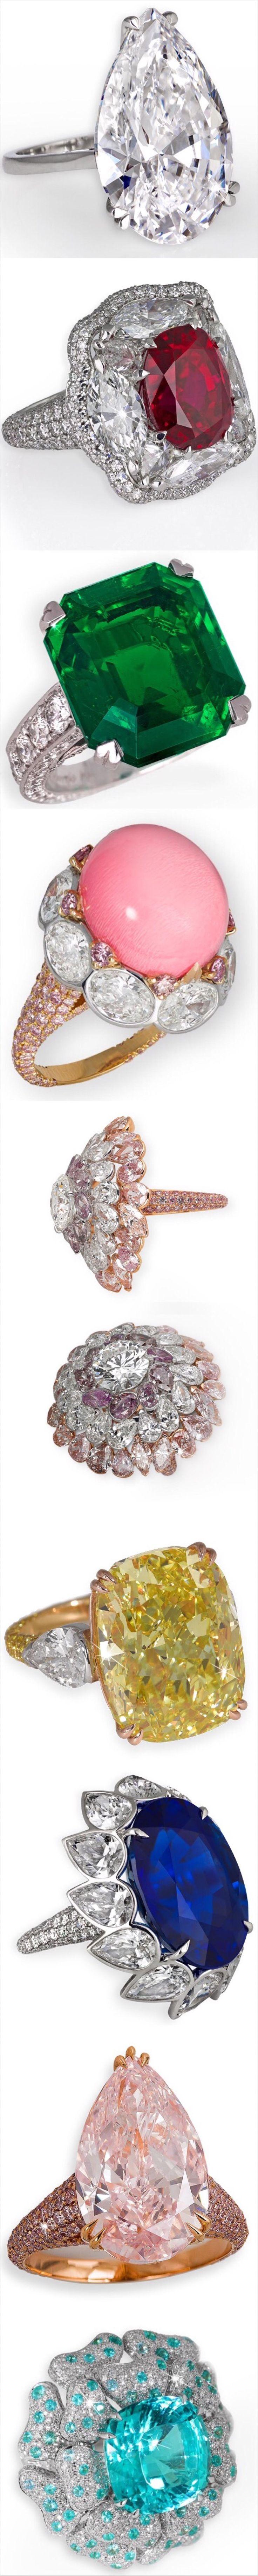 9 Stunning and Important Rings @David Morris - The London Jeweler